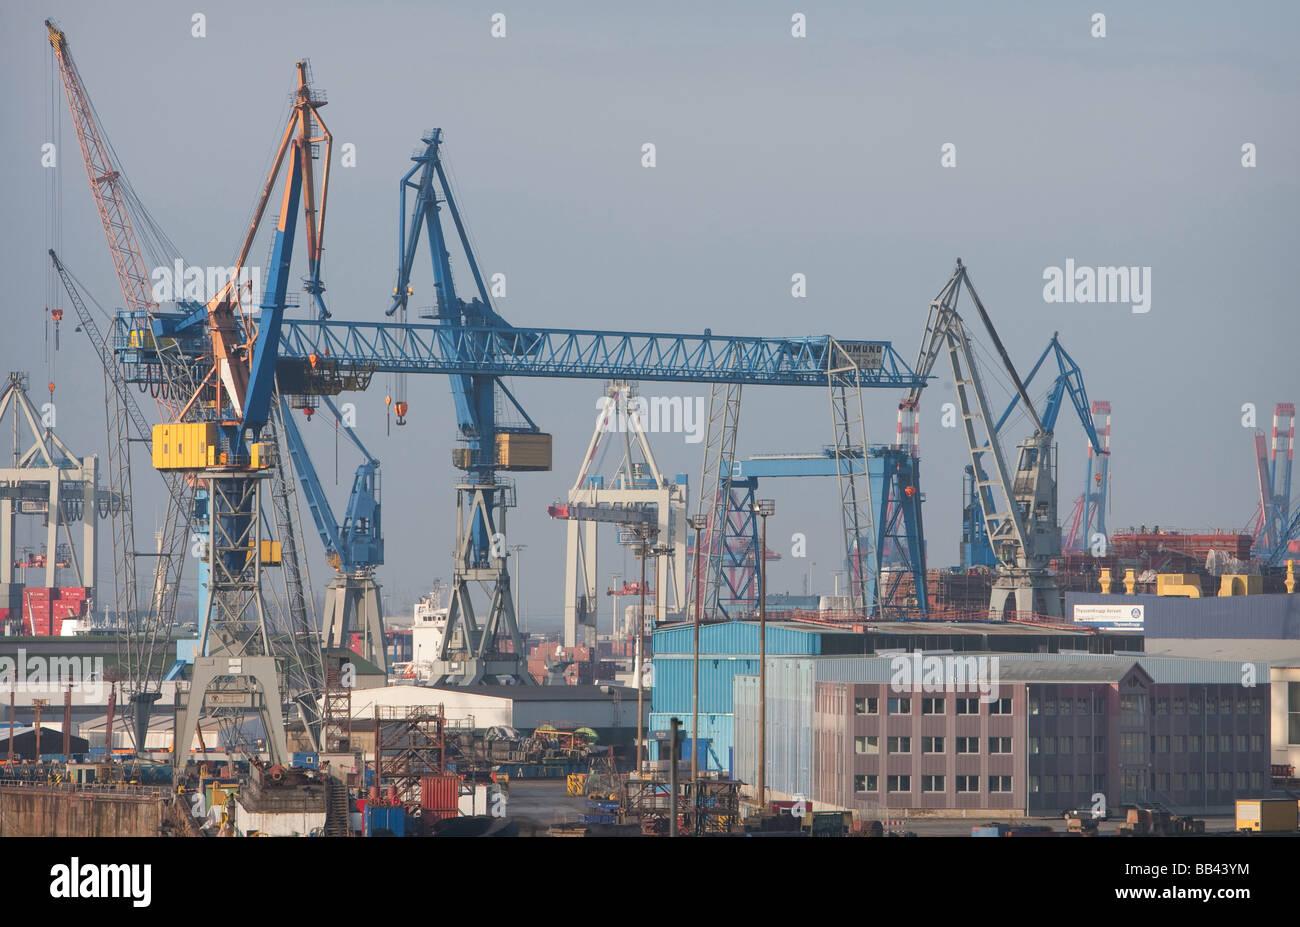 Tower Cranes at Port of Hamburg Stock Photo